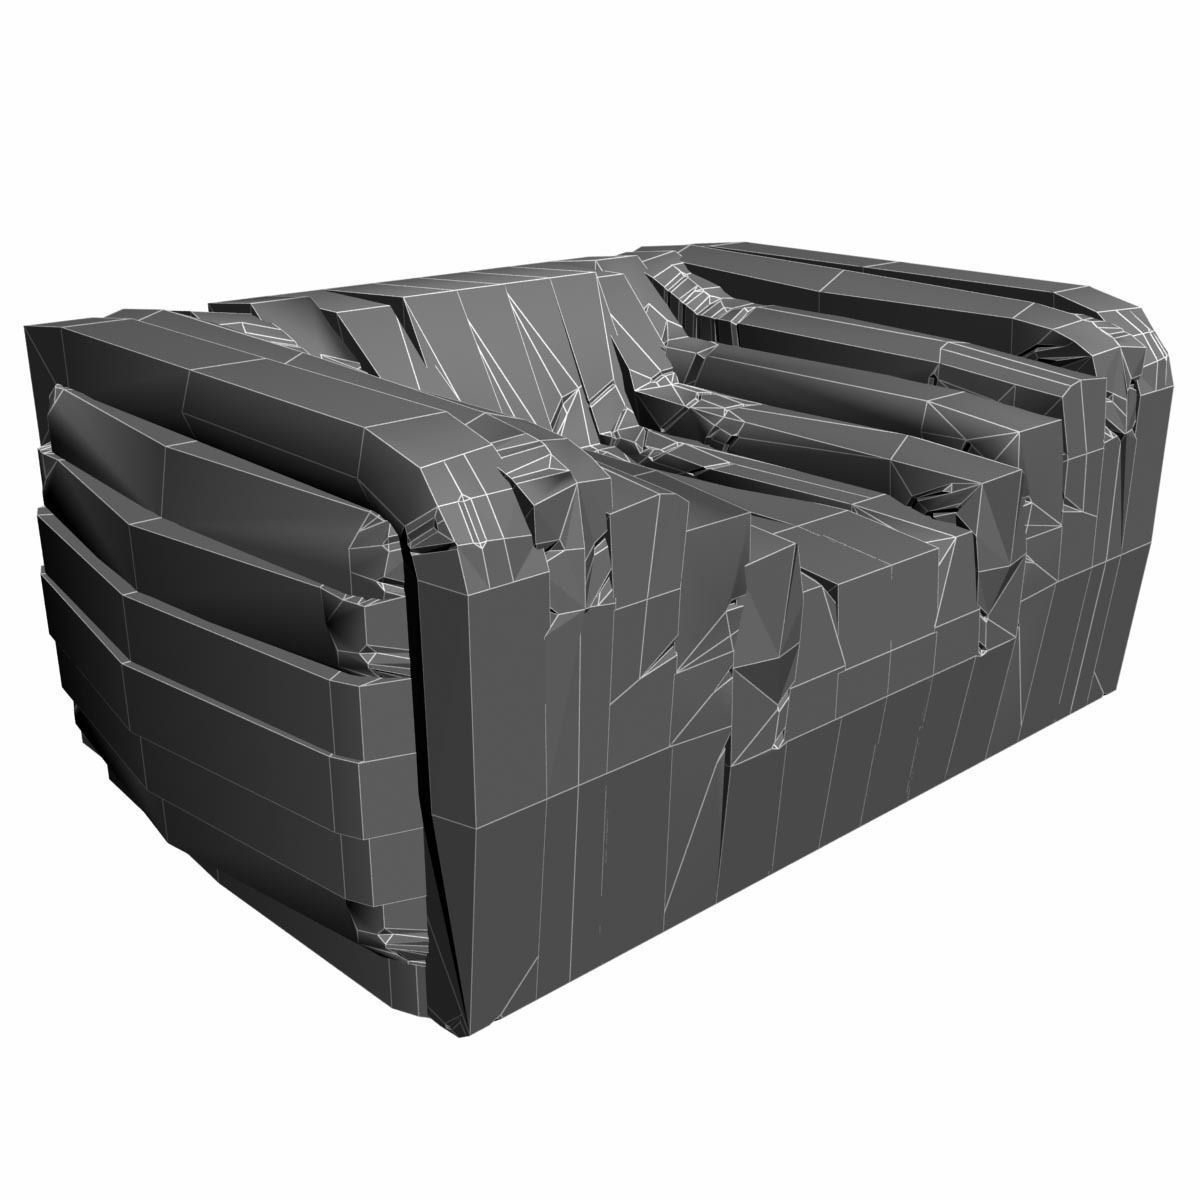 3D Versace Bubble Sofa | CGTrader